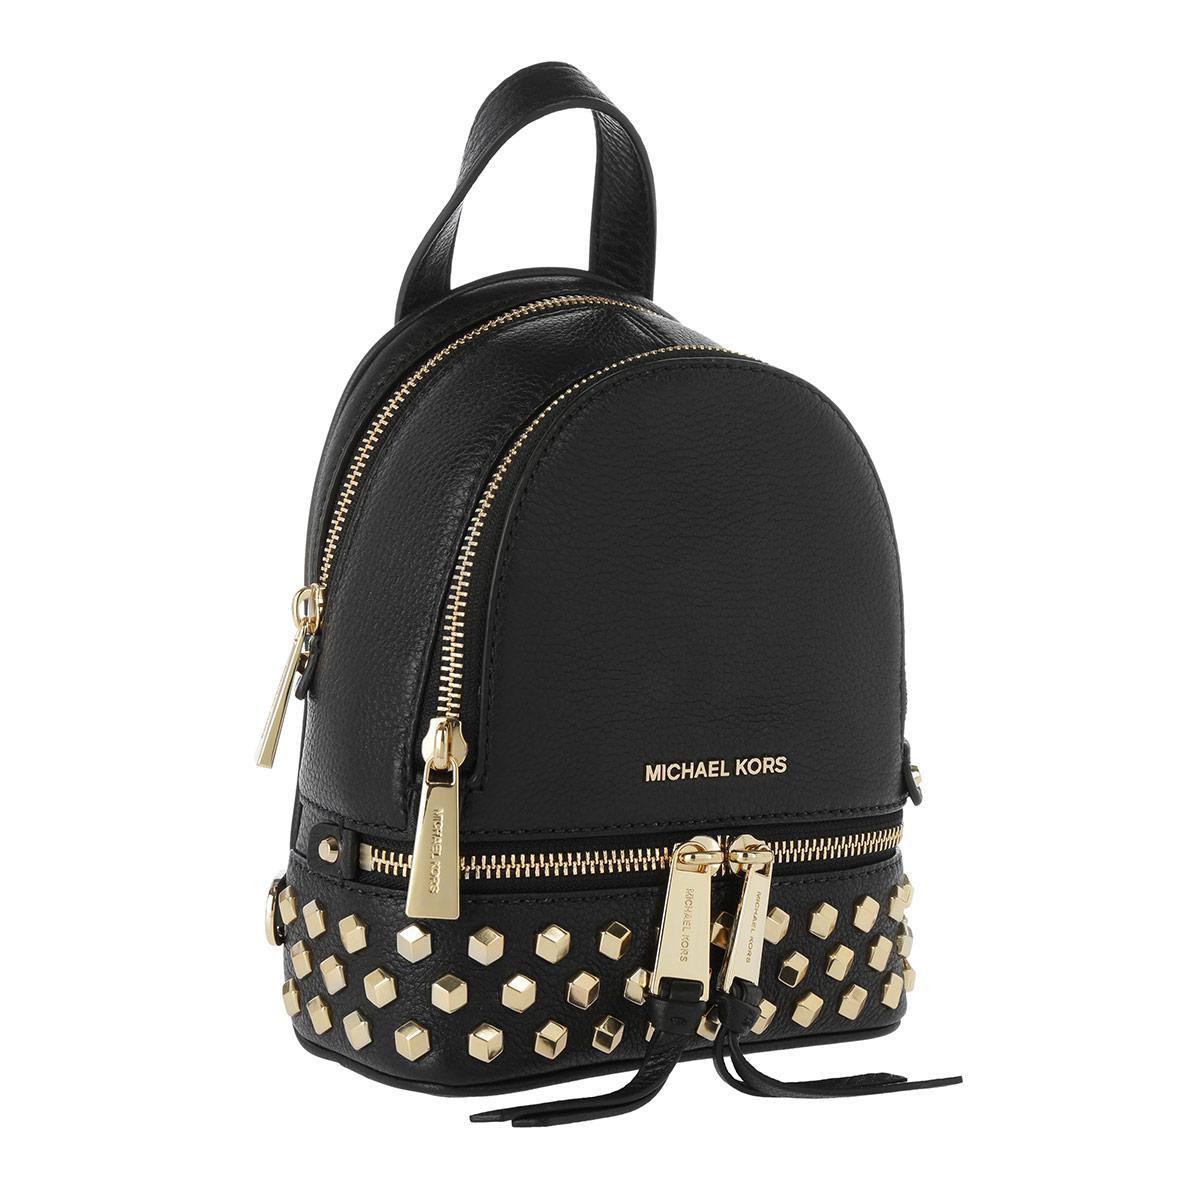 Michael Kors Denim Rhea Zip Xs Messenger Backpack Gold Black in Metallic